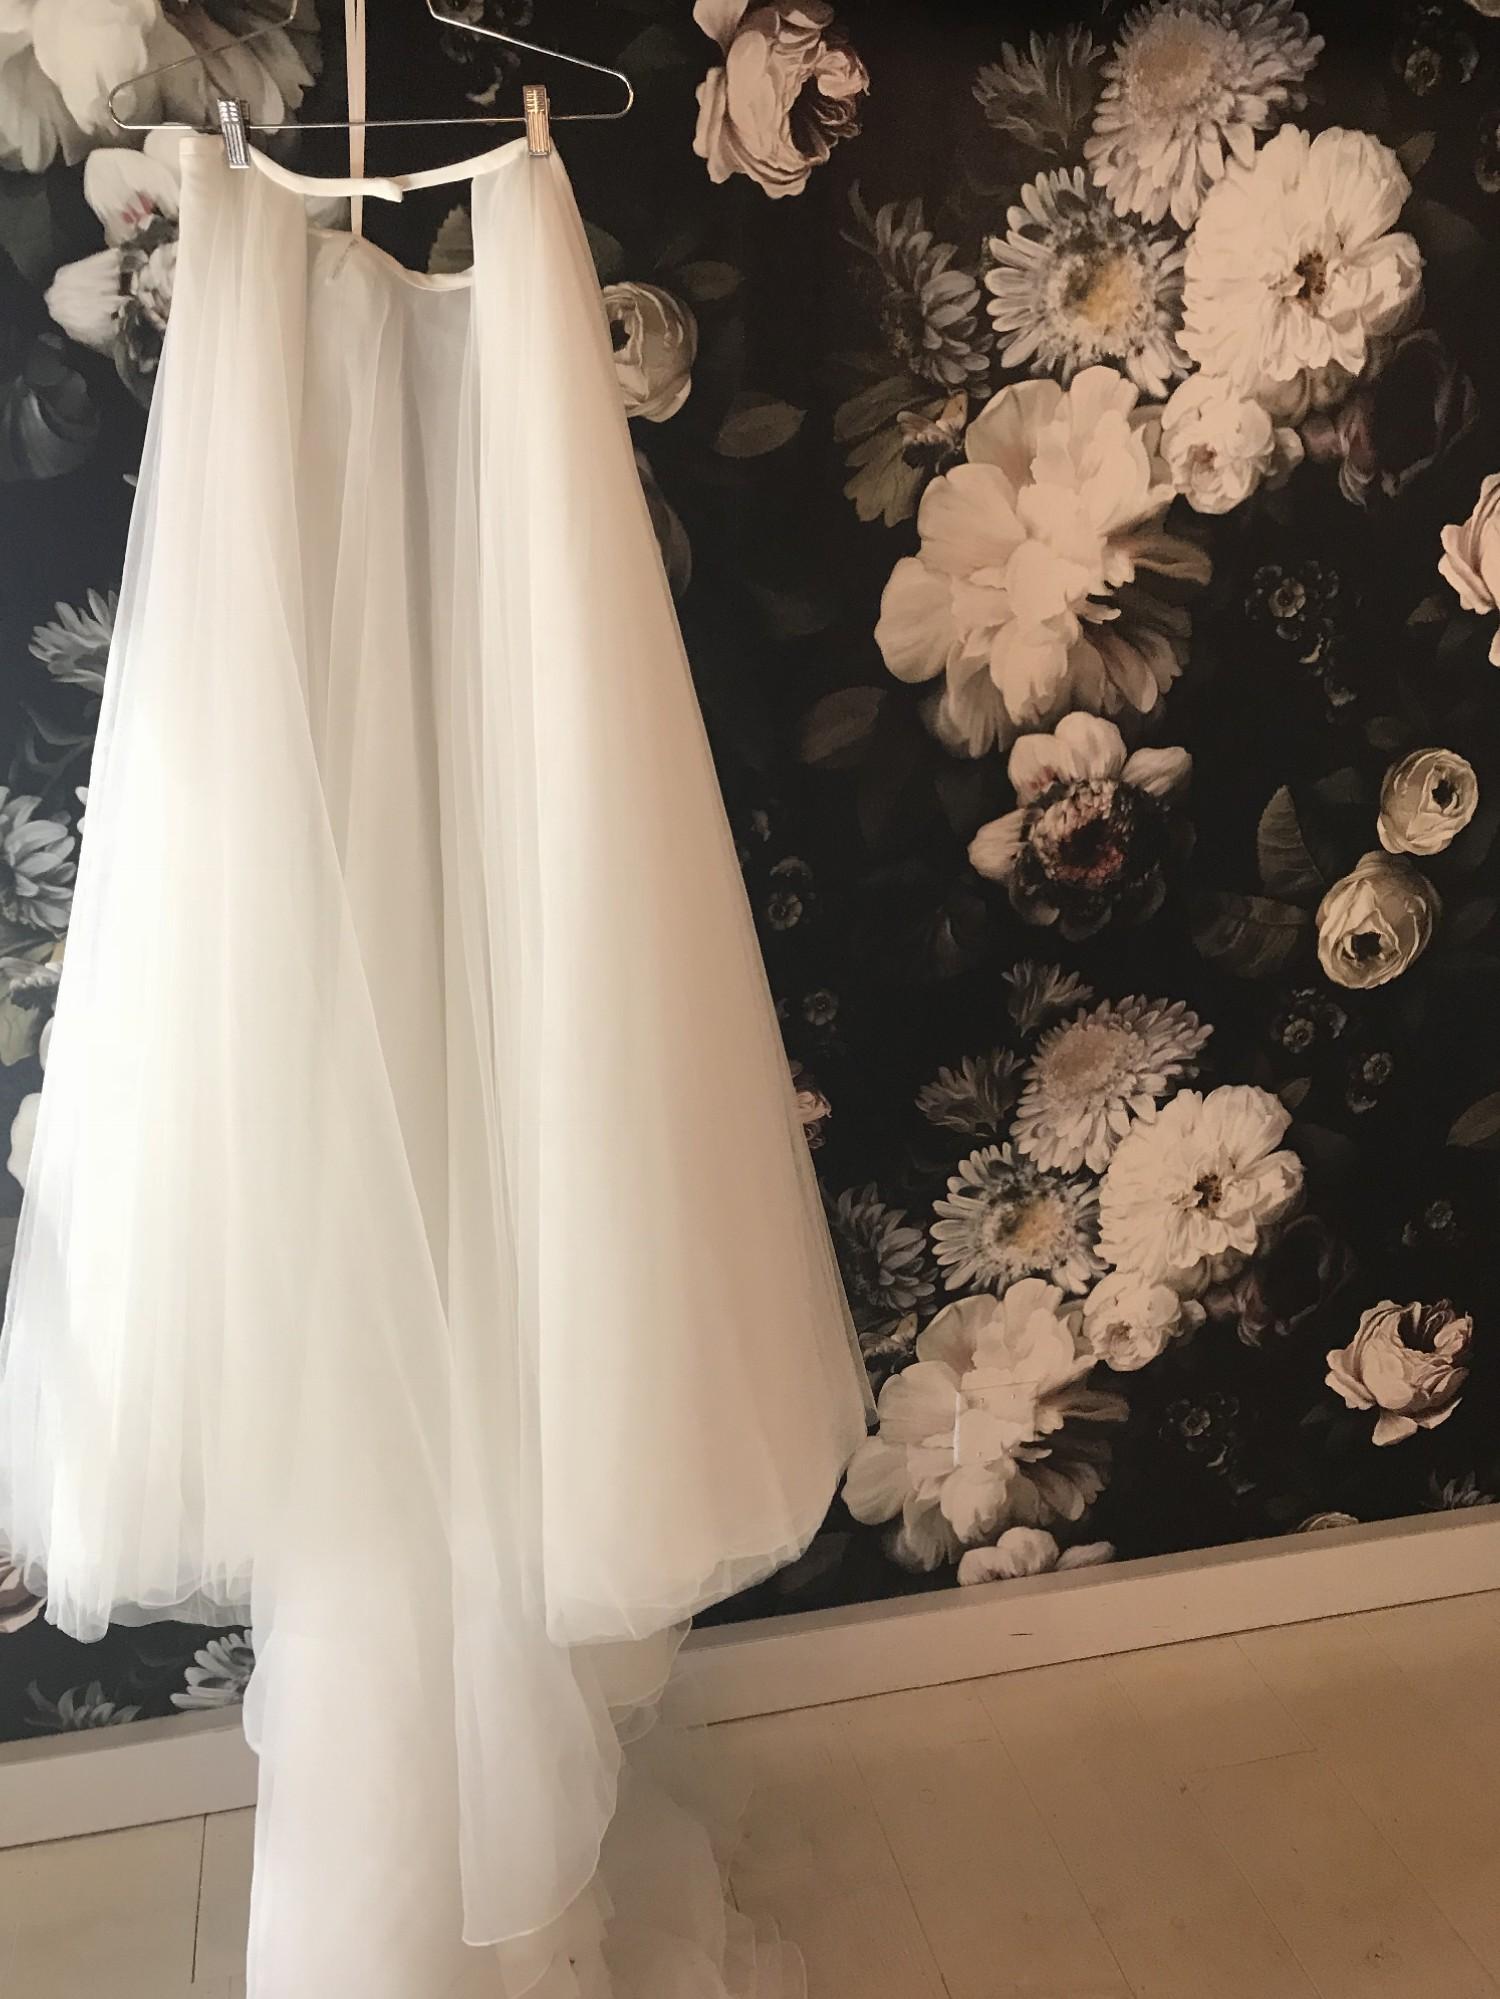 Detachable Wedding Dress.Made With Love Removable Skirt Wedding Dress On Sale 25 Off